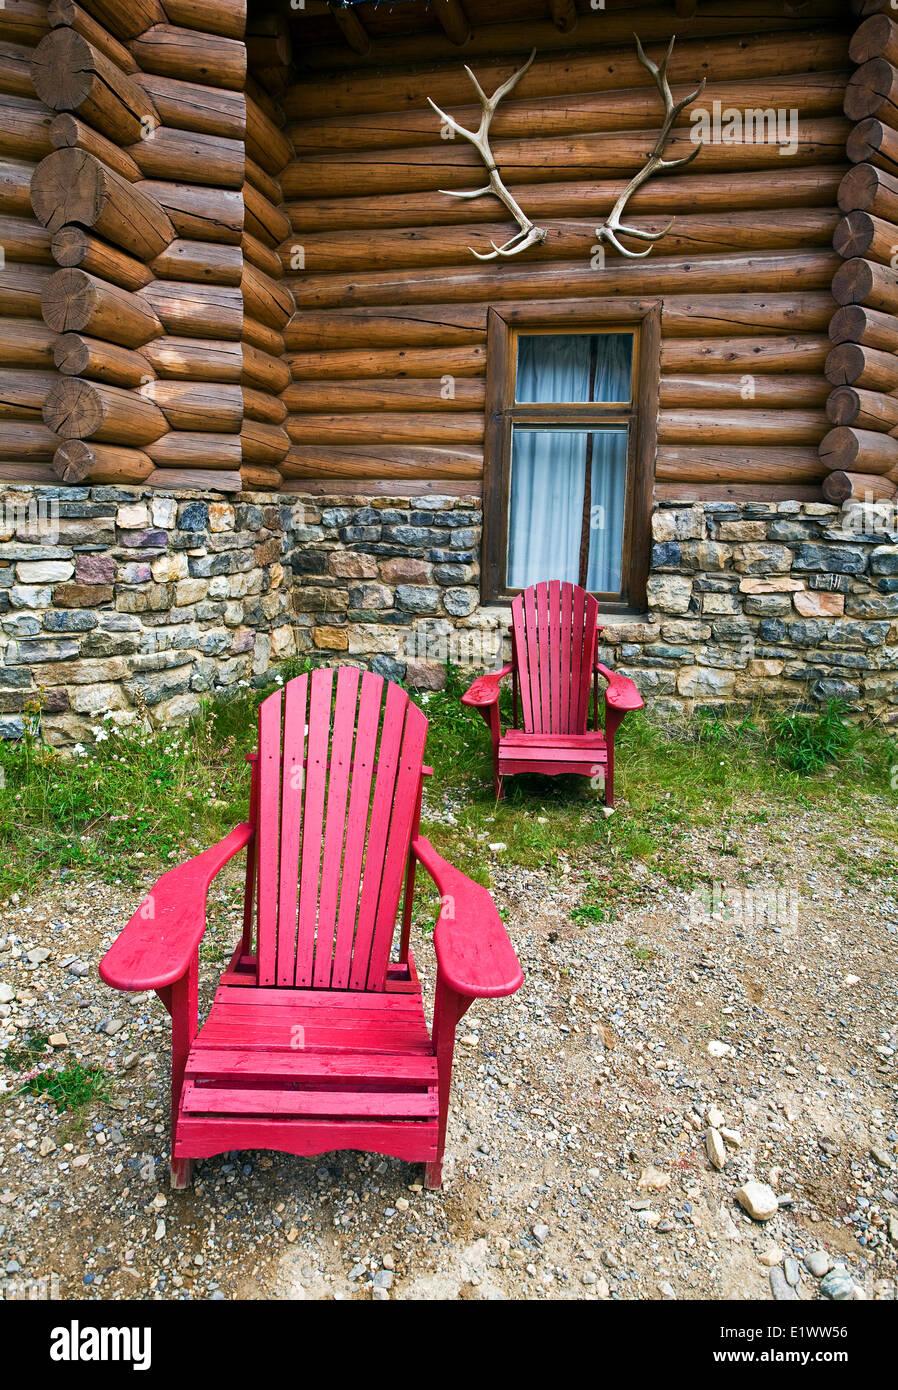 Deck chairs at Num-Ti-Jah lodge, Banff National Park, Alberta, Canada. - Stock Image